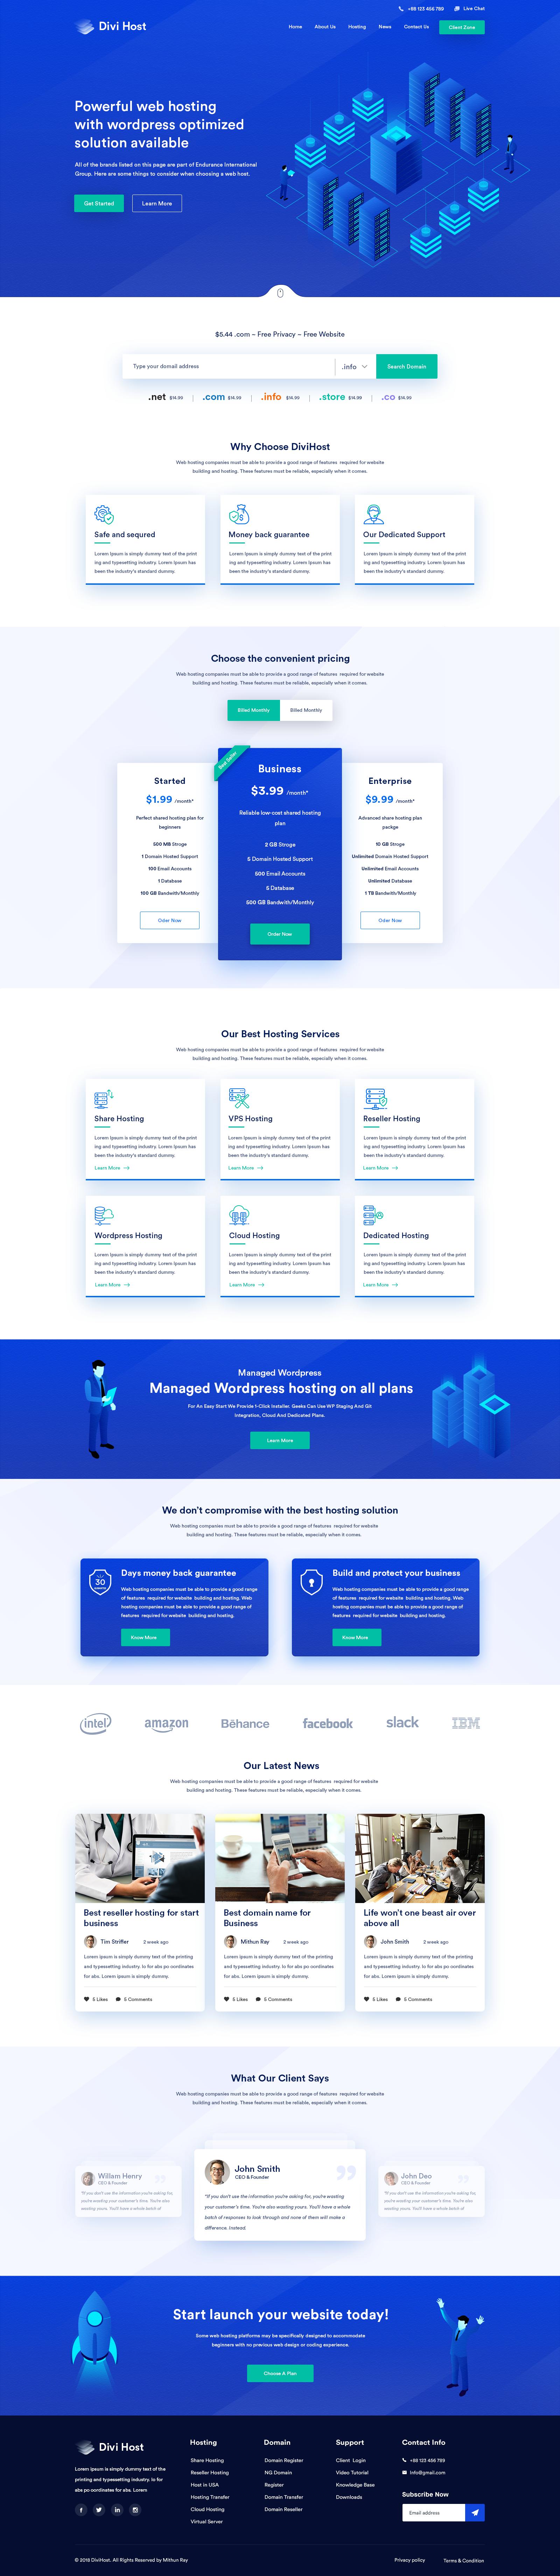 web hosting website homepage design